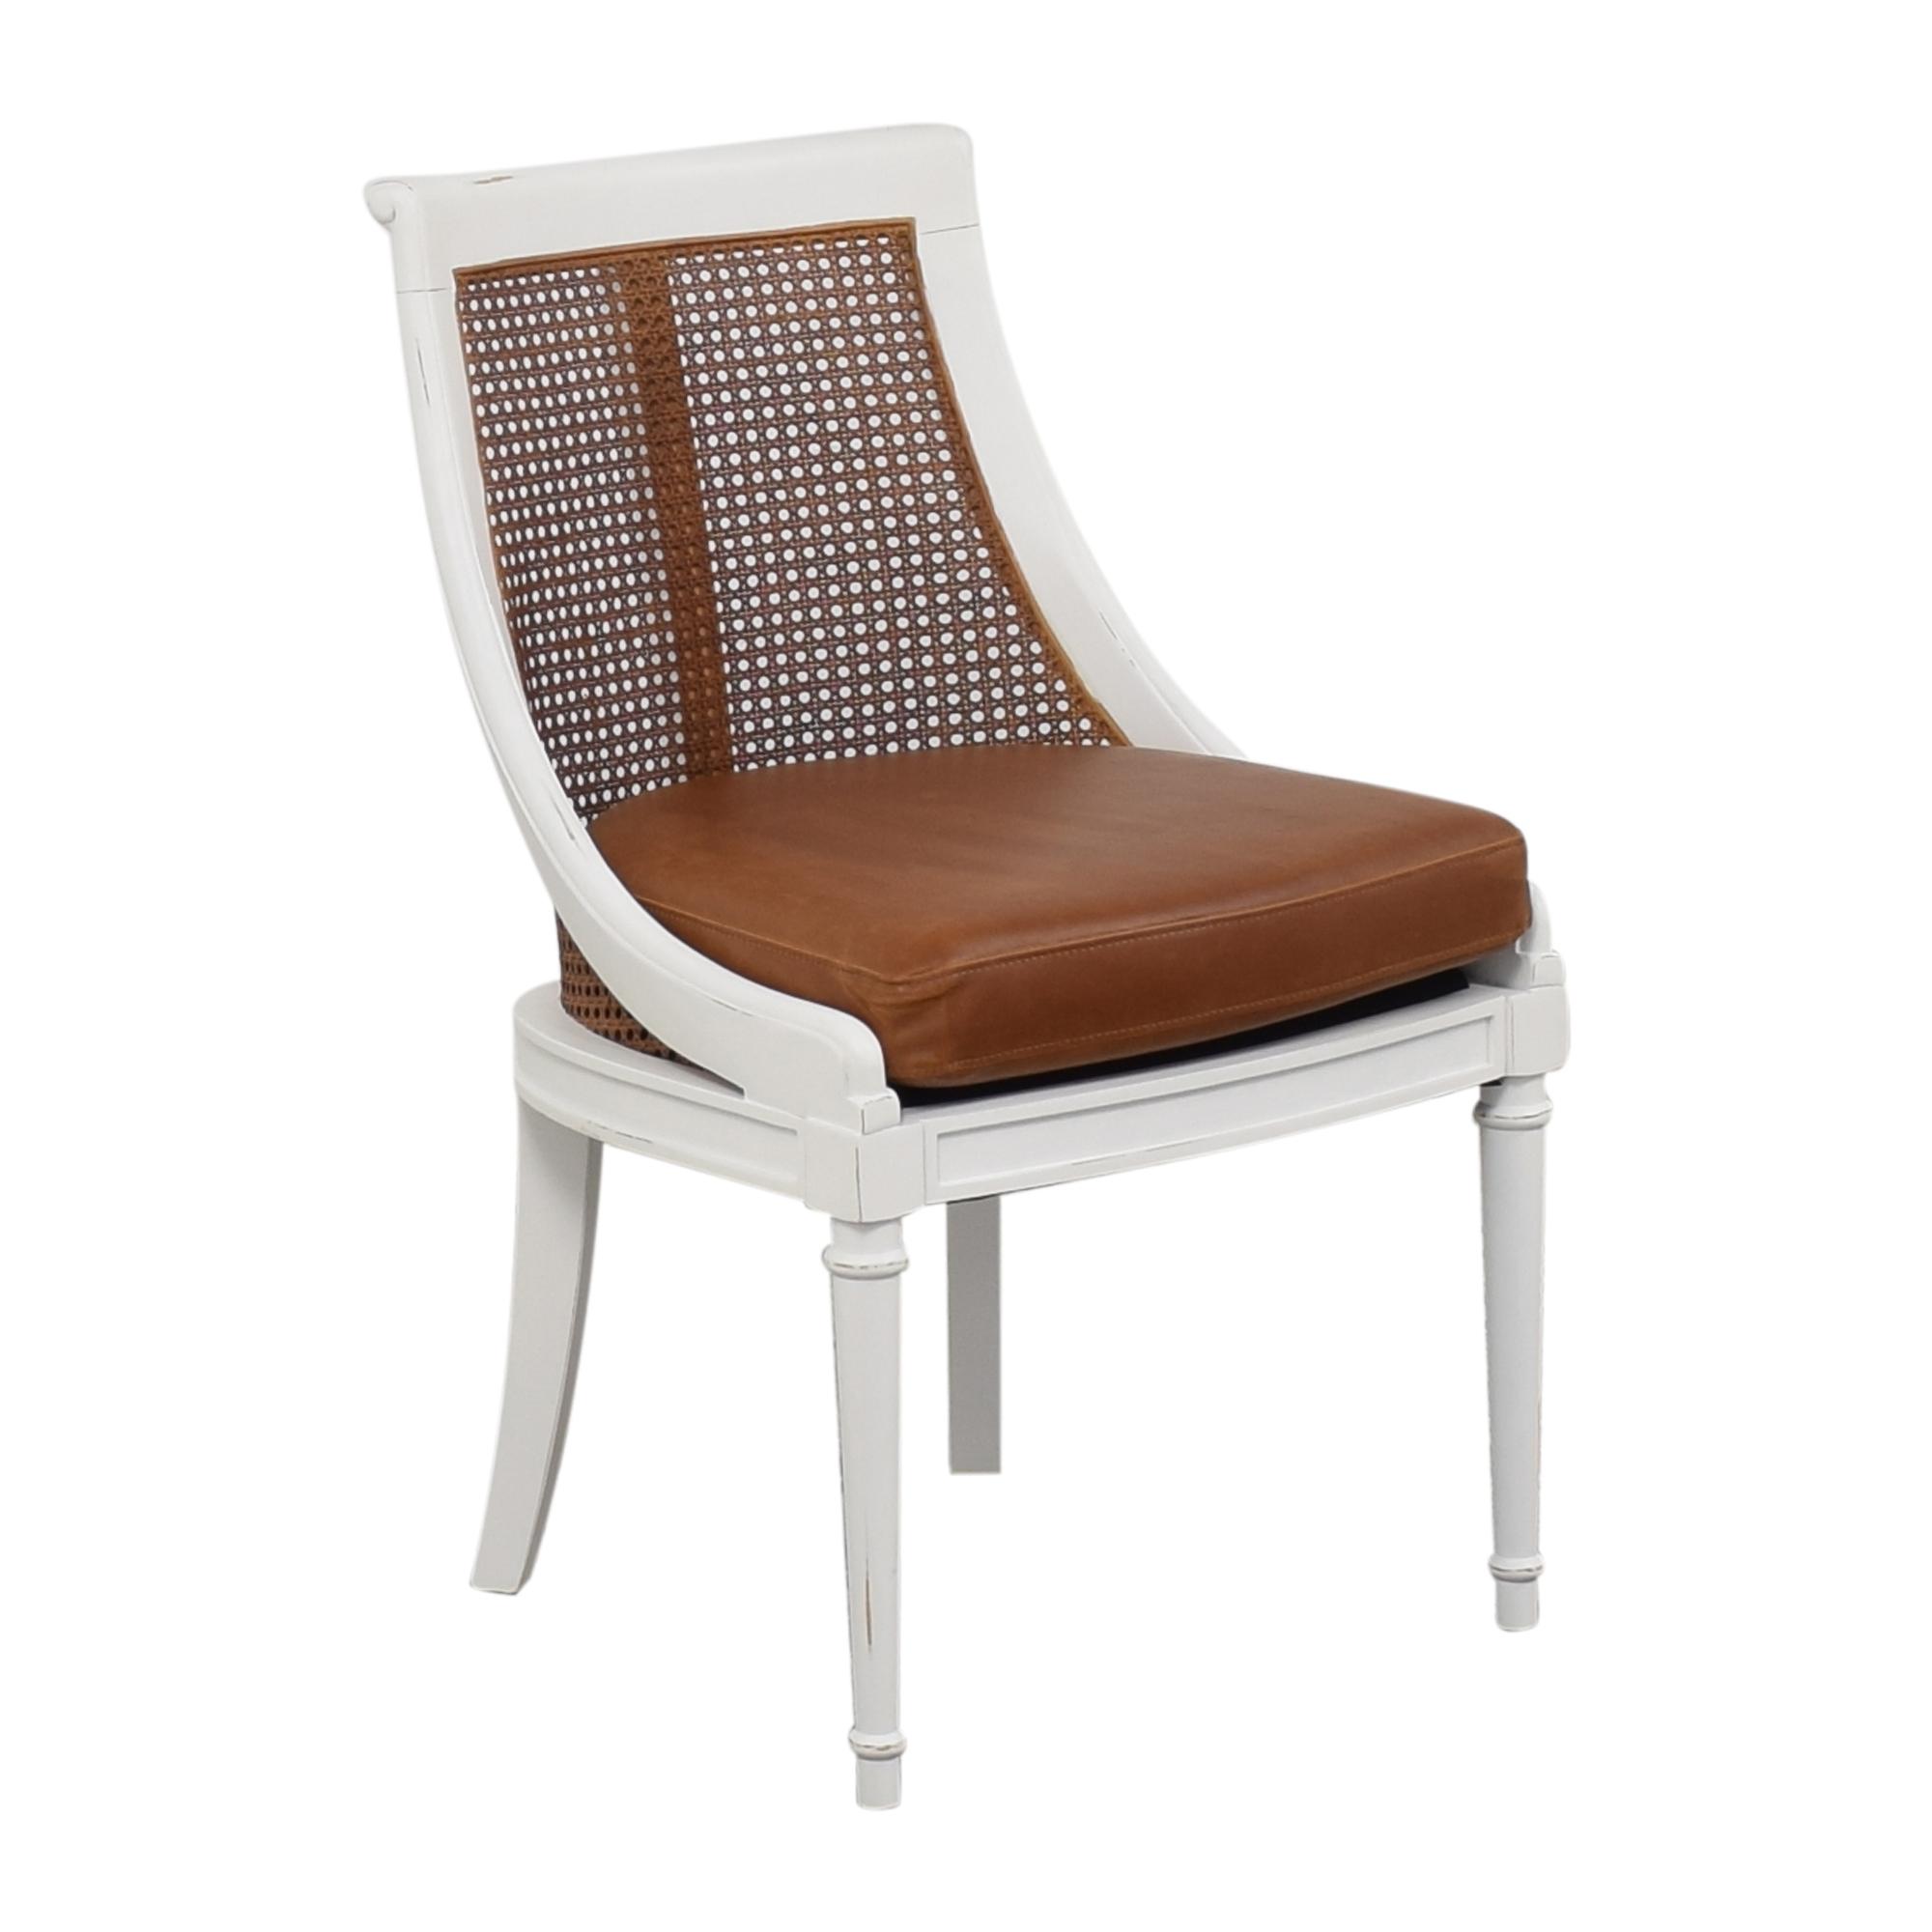 buy Safavieh Saylor Dining Chair Safavieh Chairs